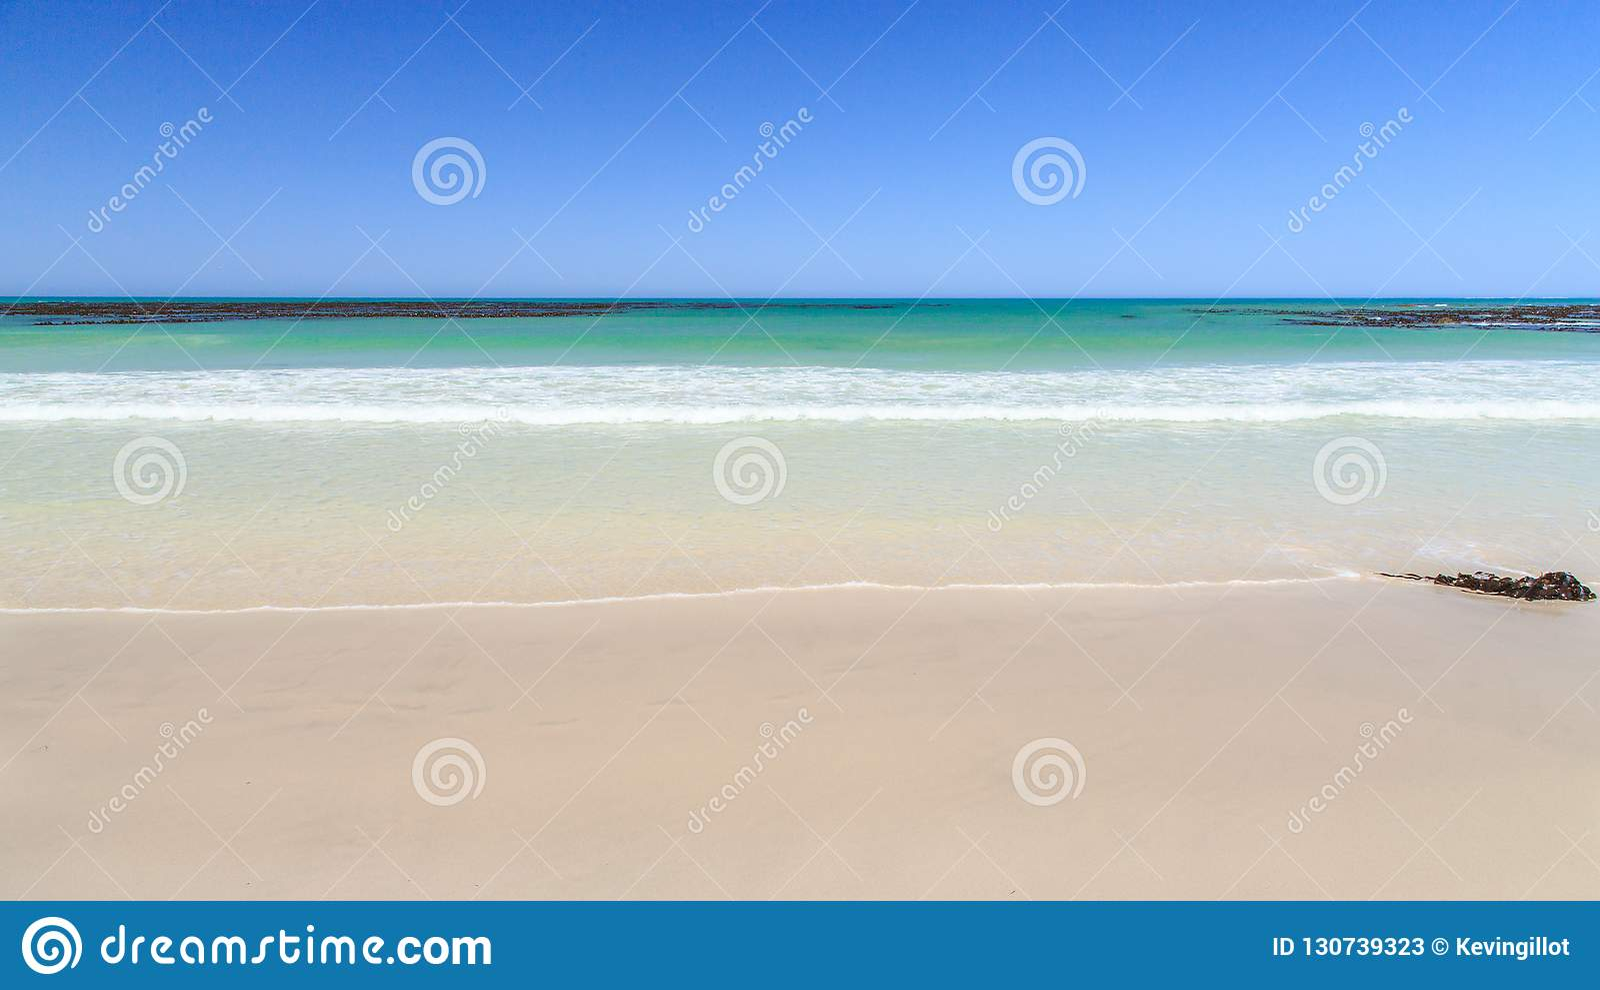 Deserted beach - Pearly beach - South Africa